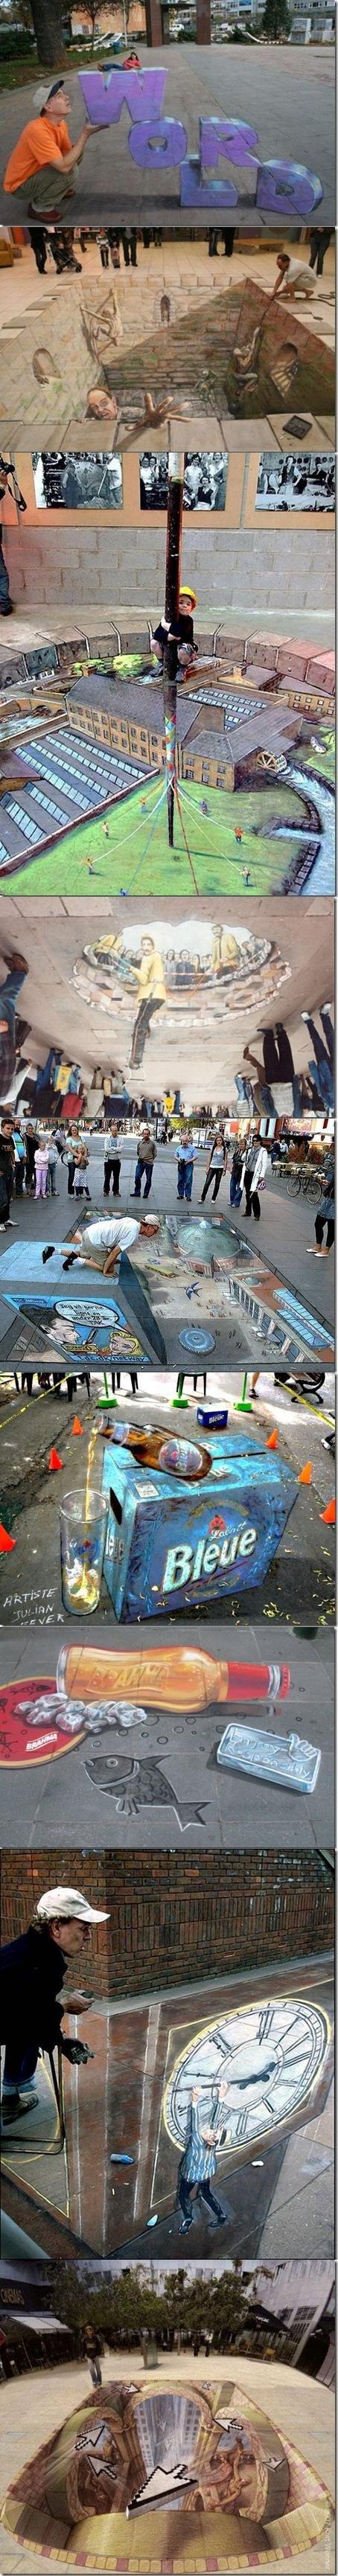 Amazing 3D sidewalk art part 2. part 1 funnyjunk.com/funny_pictures/155184/Amazing+3D+sidewalk+art/.. and then it rains :)